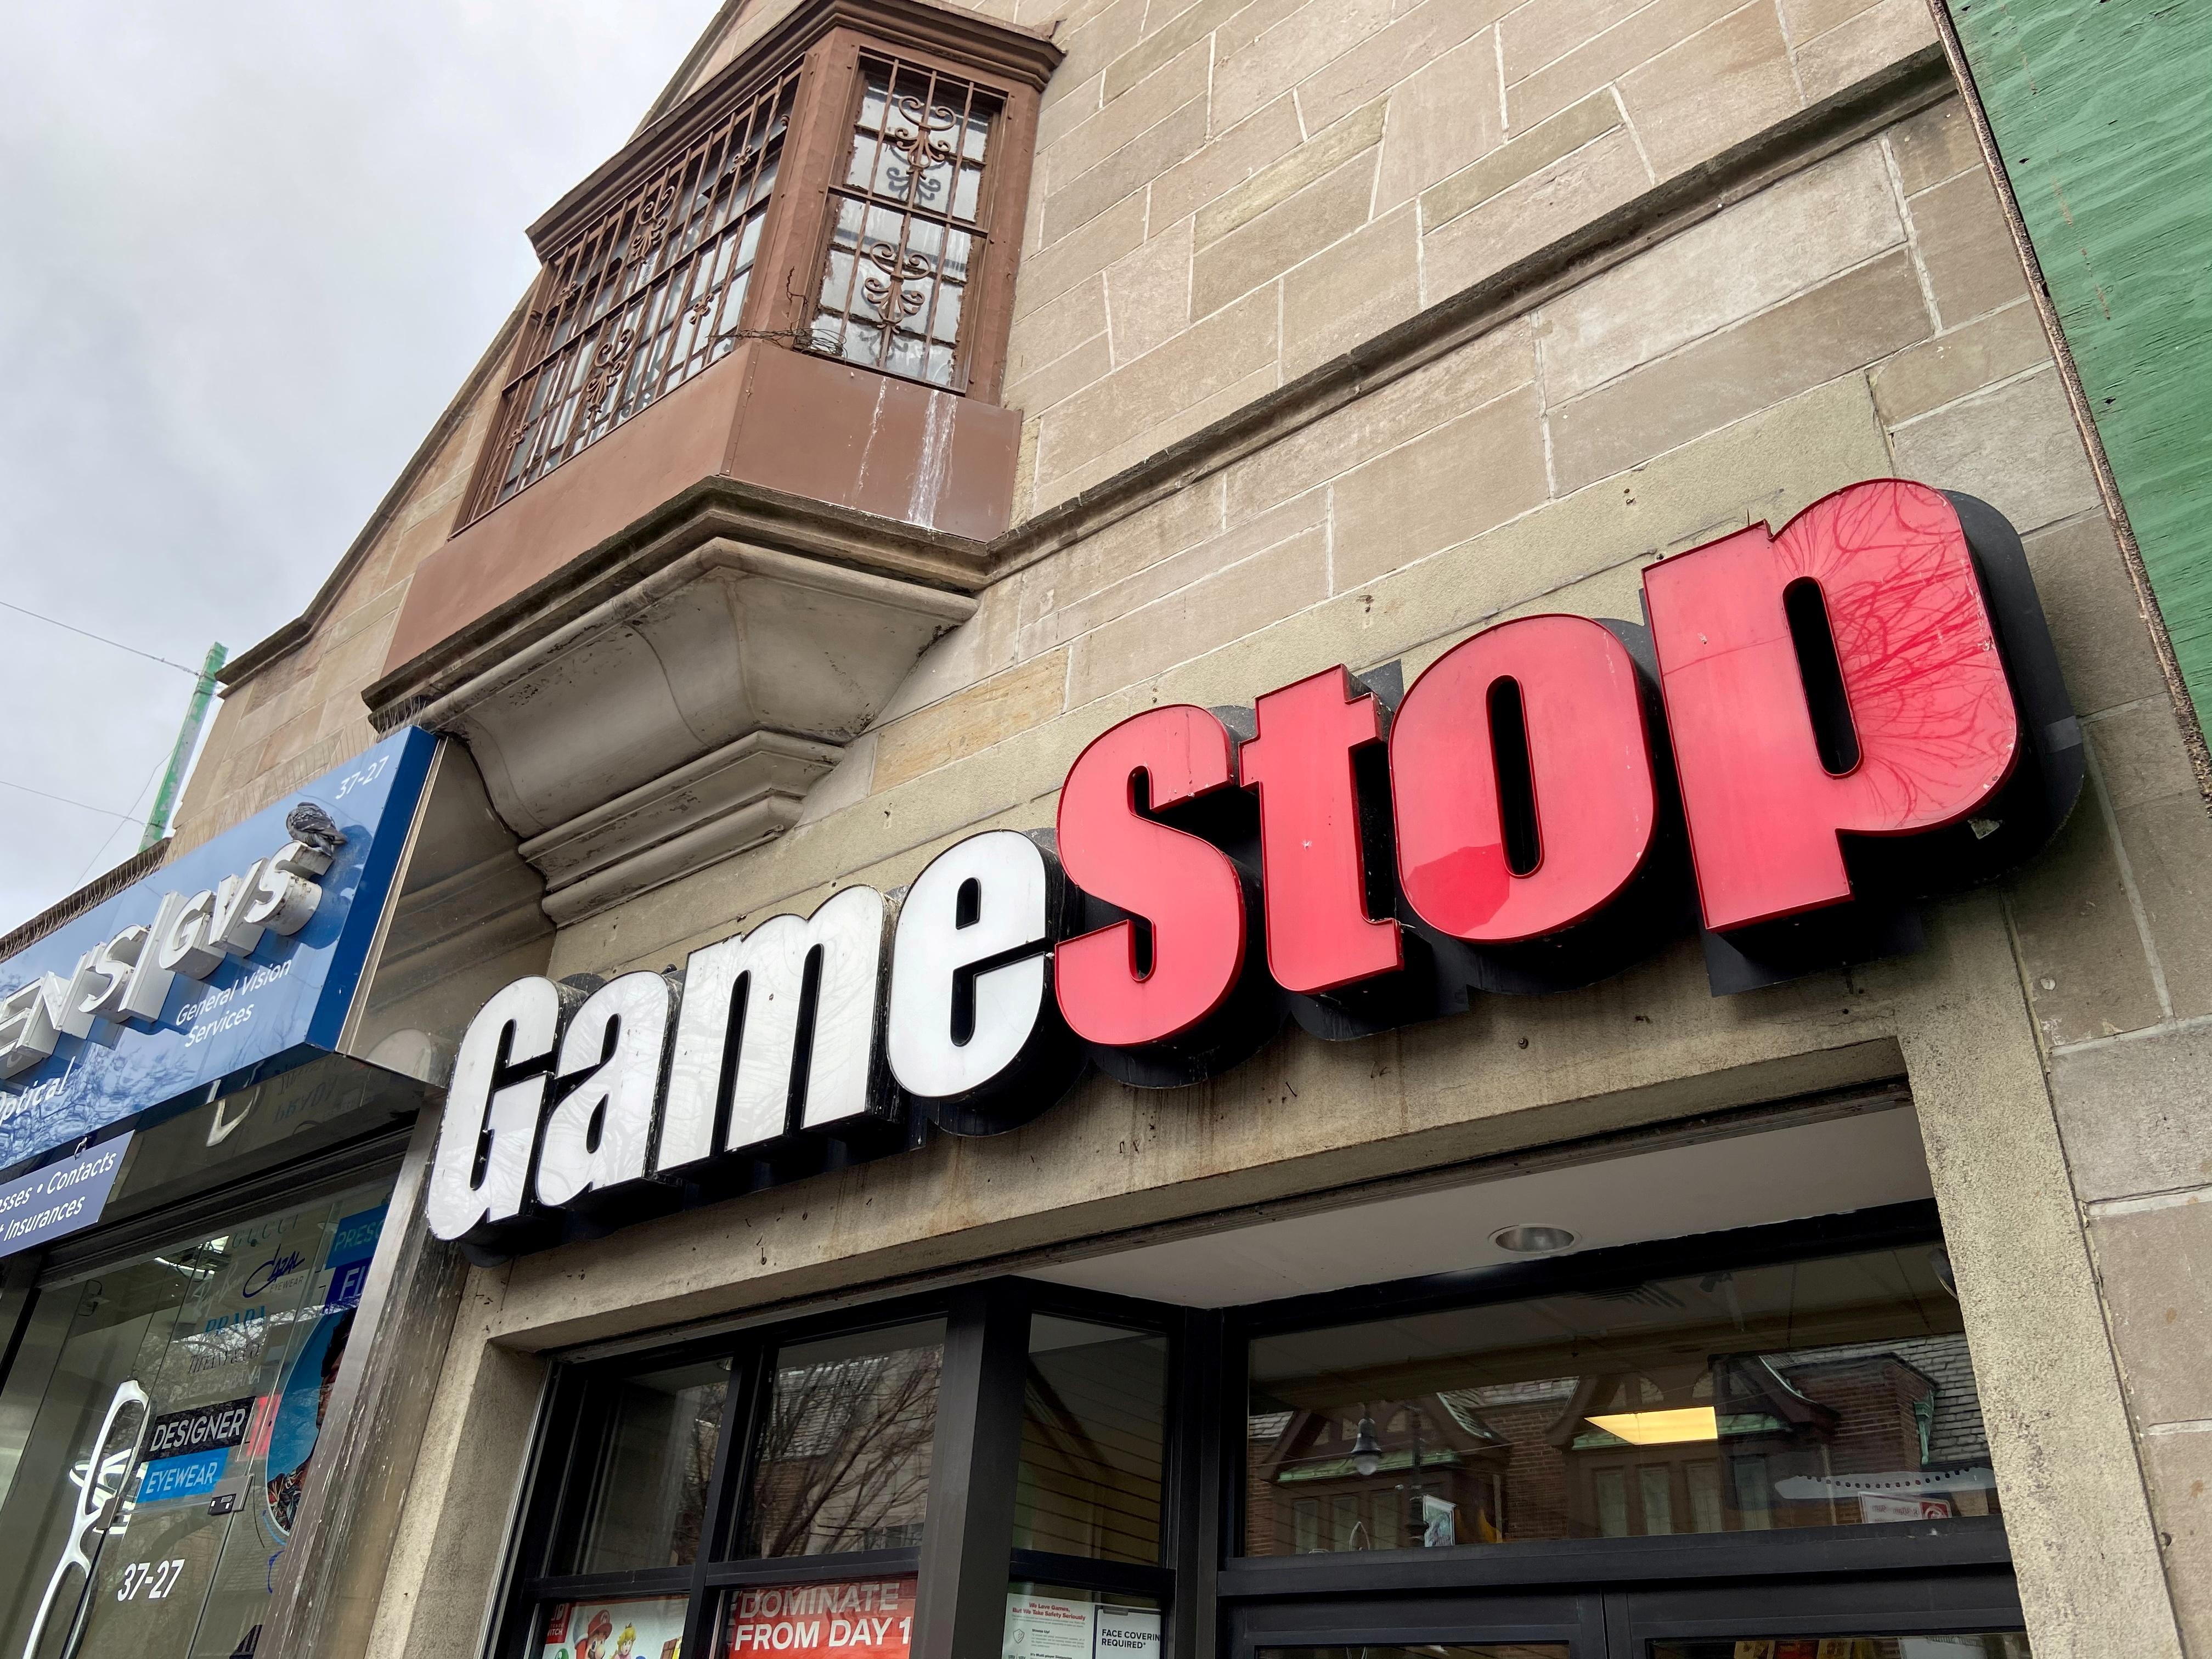 A GameStop store is seen in the Jackson Heights neighborhood of New York City, New York, U.S. January 27, 2021. REUTERS/Nick Zieminski